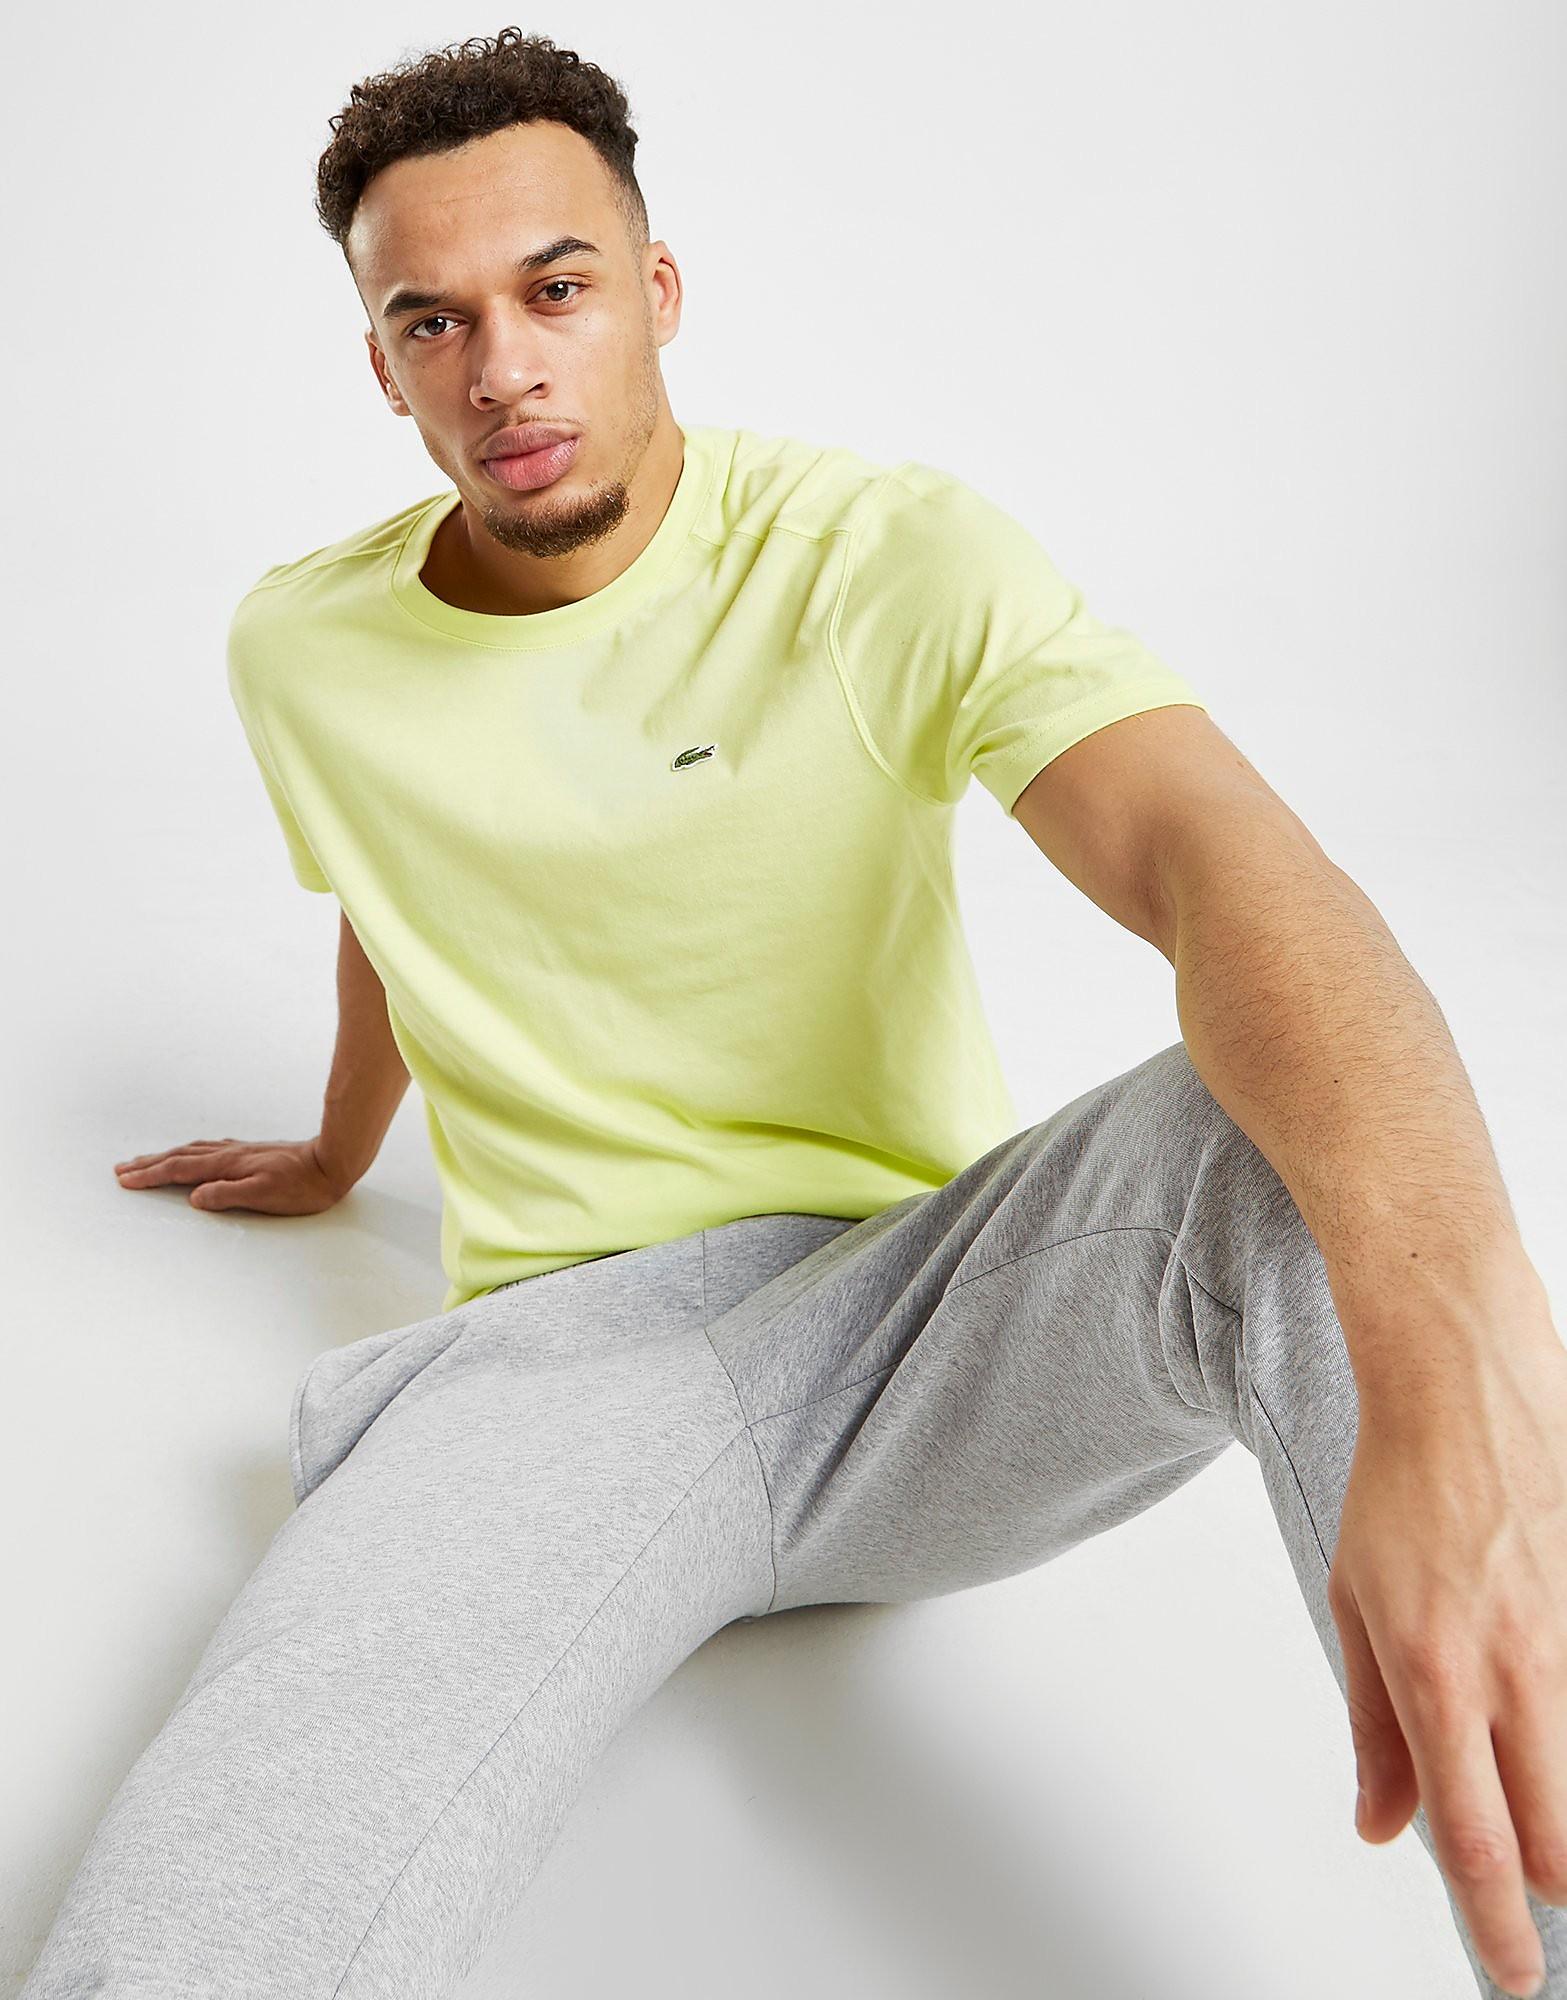 Lacoste Croc Logo Short Sleeve T-Shirt Heren - Groen - Heren